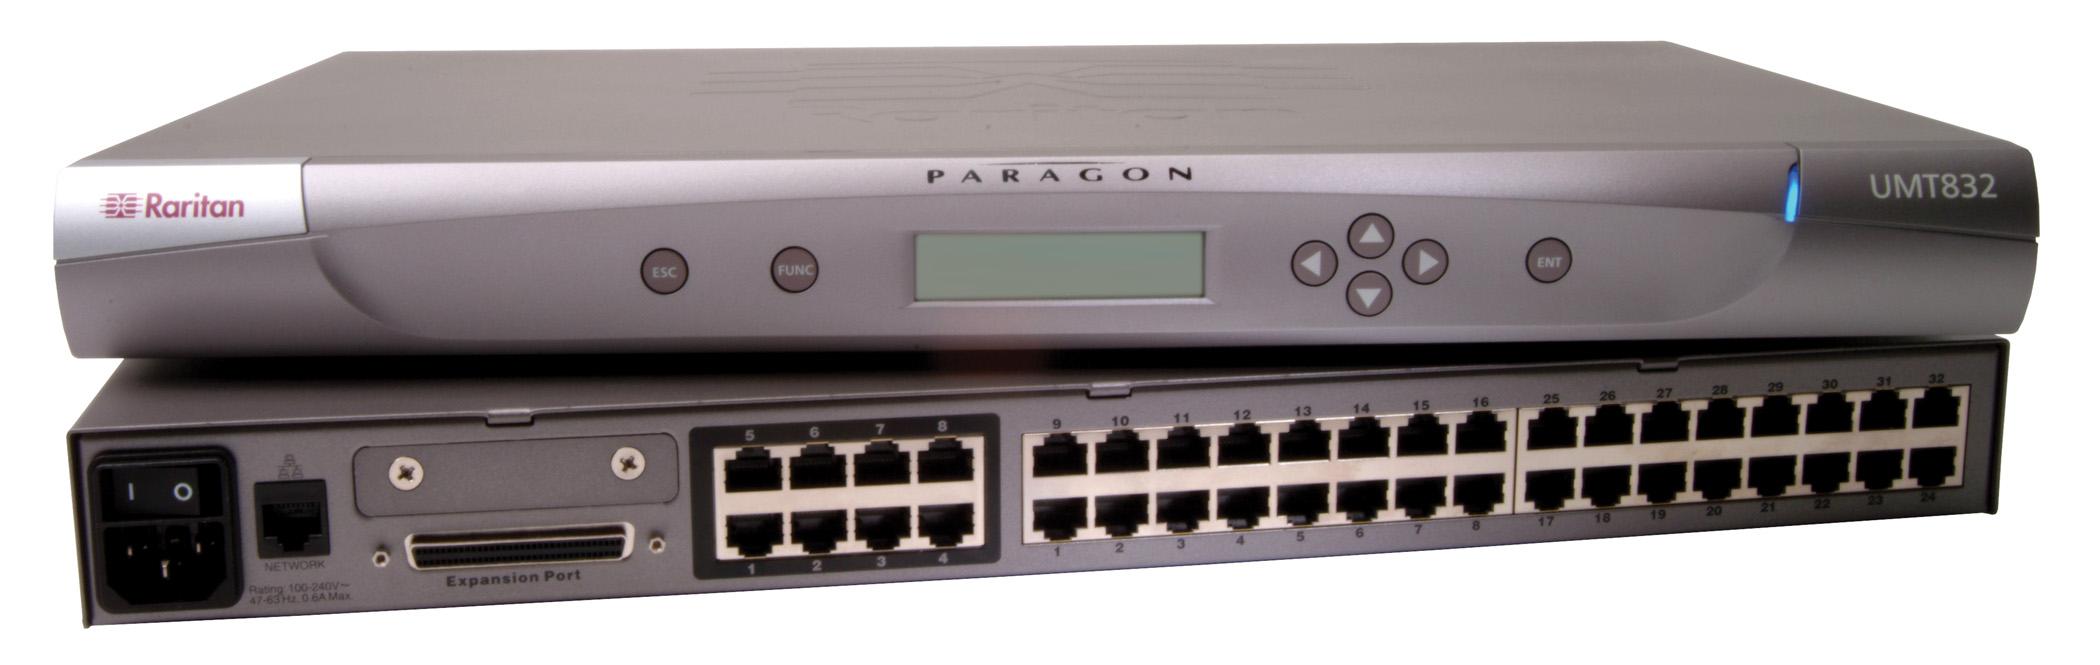 Raritan Paragon II P2-UMT832 8 User 32 Port KVM Switch